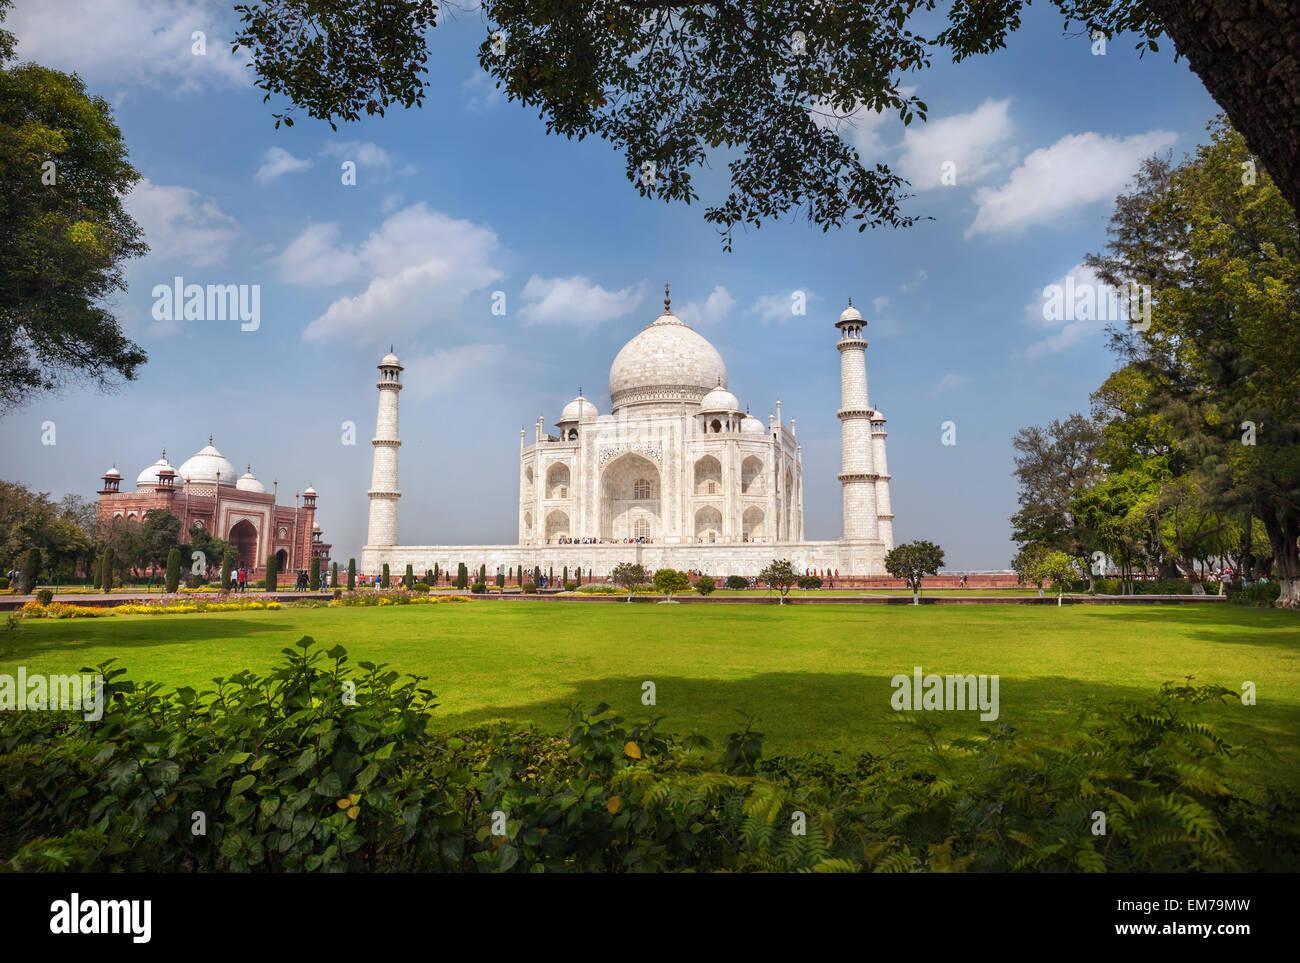 Taj Mahal tumba y pasto verde en azul cielo nublado en Agra, Uttar Pradesh, India Imagen De Stock